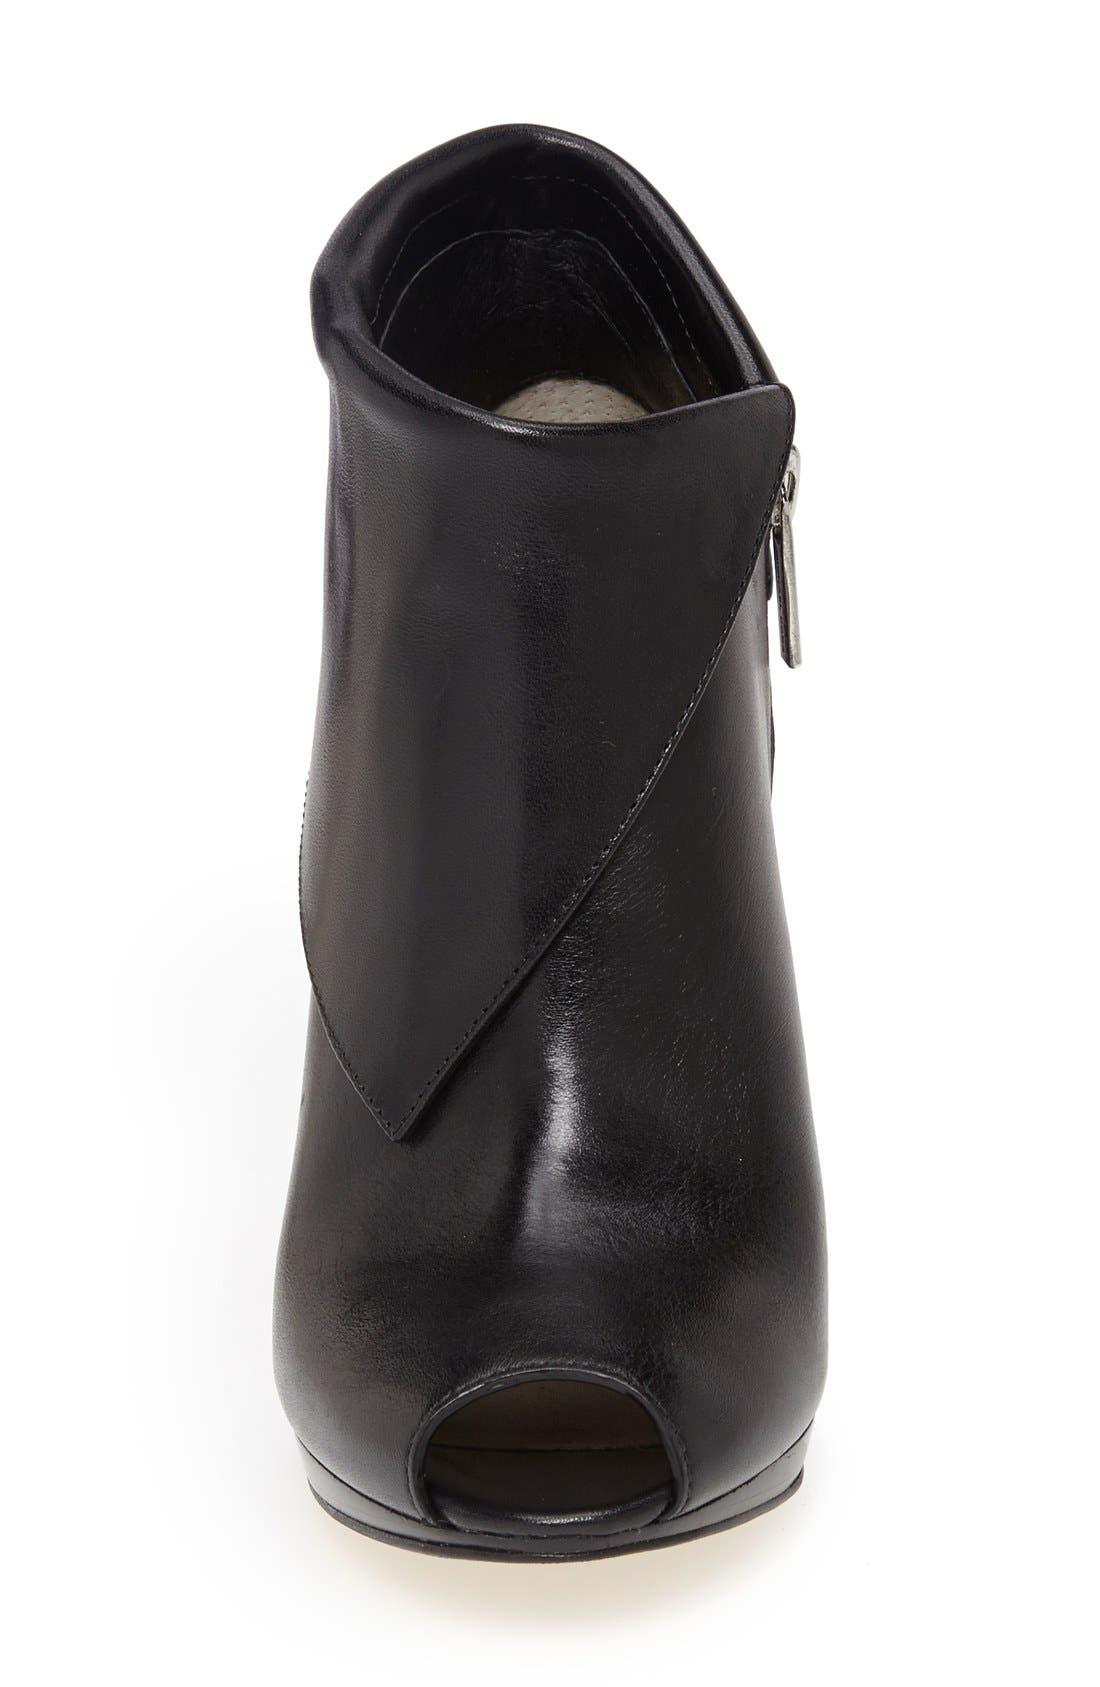 'Kendra' Peep Toe Bootie,                             Alternate thumbnail 3, color,                             Black